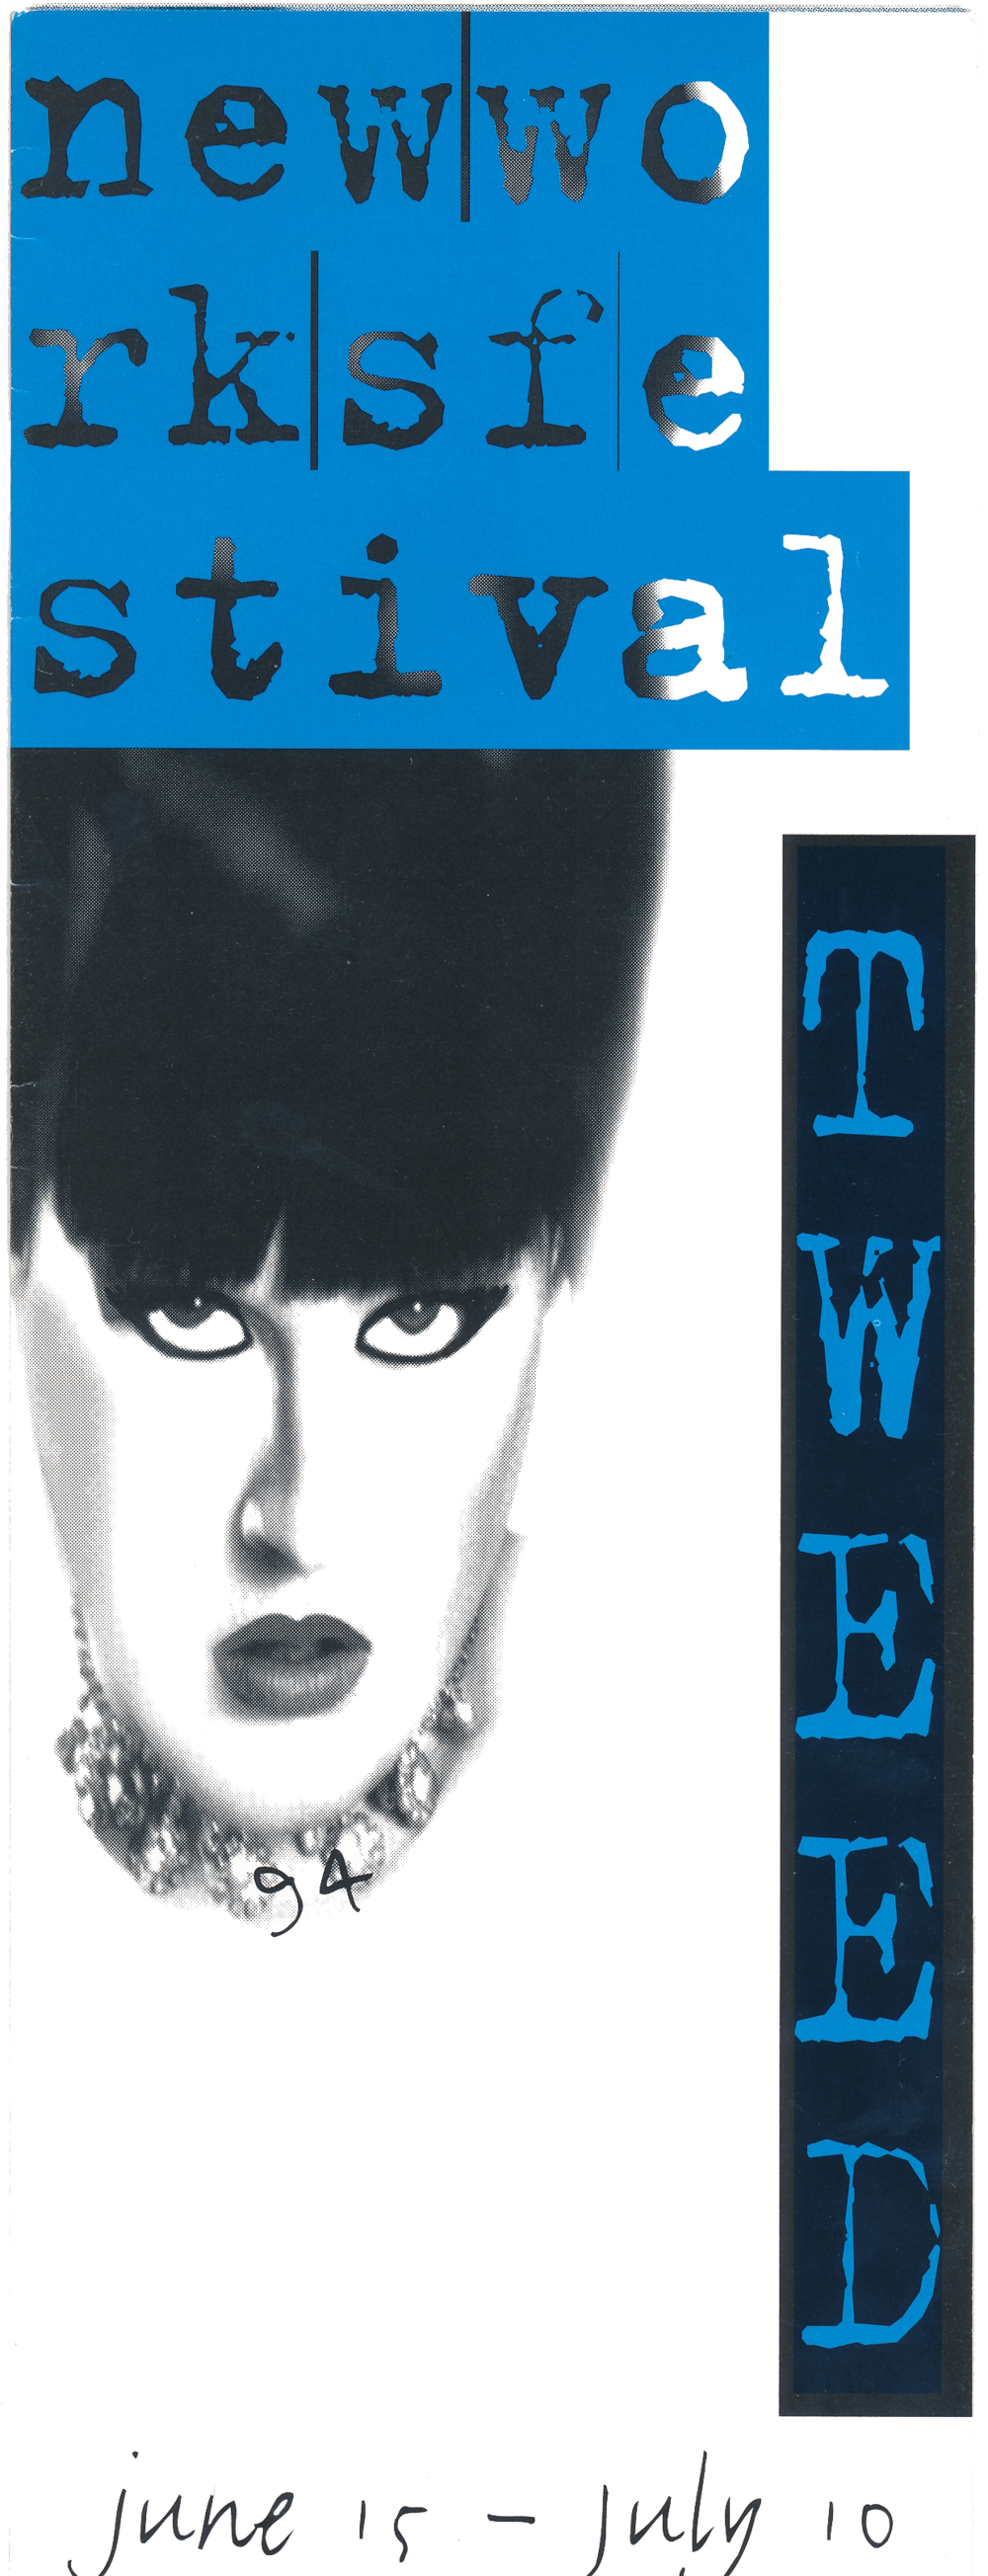 NEW WORKS FESTIVAL #10, 1994 - THE VINEYARDQUEERFEST (curated by Emmett Foster)The Fabulous Lypsinka ShowVarla Jean MermanMark DendyThe Mesopotamian Opera CompanyCraig HickmanFemme Dykes of the 90'sGeorg Osterman & Lola PashalinskiPeggy ShawPERFORMANCE(curated by Emmett Foster)Tom CaylerSally GreenhouseAmanda VogelShannon WoolleyNEW MUSIC (curated by Kirsten Vogelsang)Crystal RadioNobles of The Mystic ShrineNEW PLAYS (curated by Mac Wellman)Susan F. BennettConstance CongdonElana GreenfieldLen JenkinJeffrey M. JonesAdrienne KennedyJudy McGuireKate Moira RyanCaridad SvichDoug WrightDANCE (curated by Jane Comfort)Nancy Alforo & Jane SettedacoSari EcklerKeely Garfield's Sinister SlapstickStanley Love Performance GroupJaime OrtegaReeves Jones Performance GroupKathy RoseValerie Striar